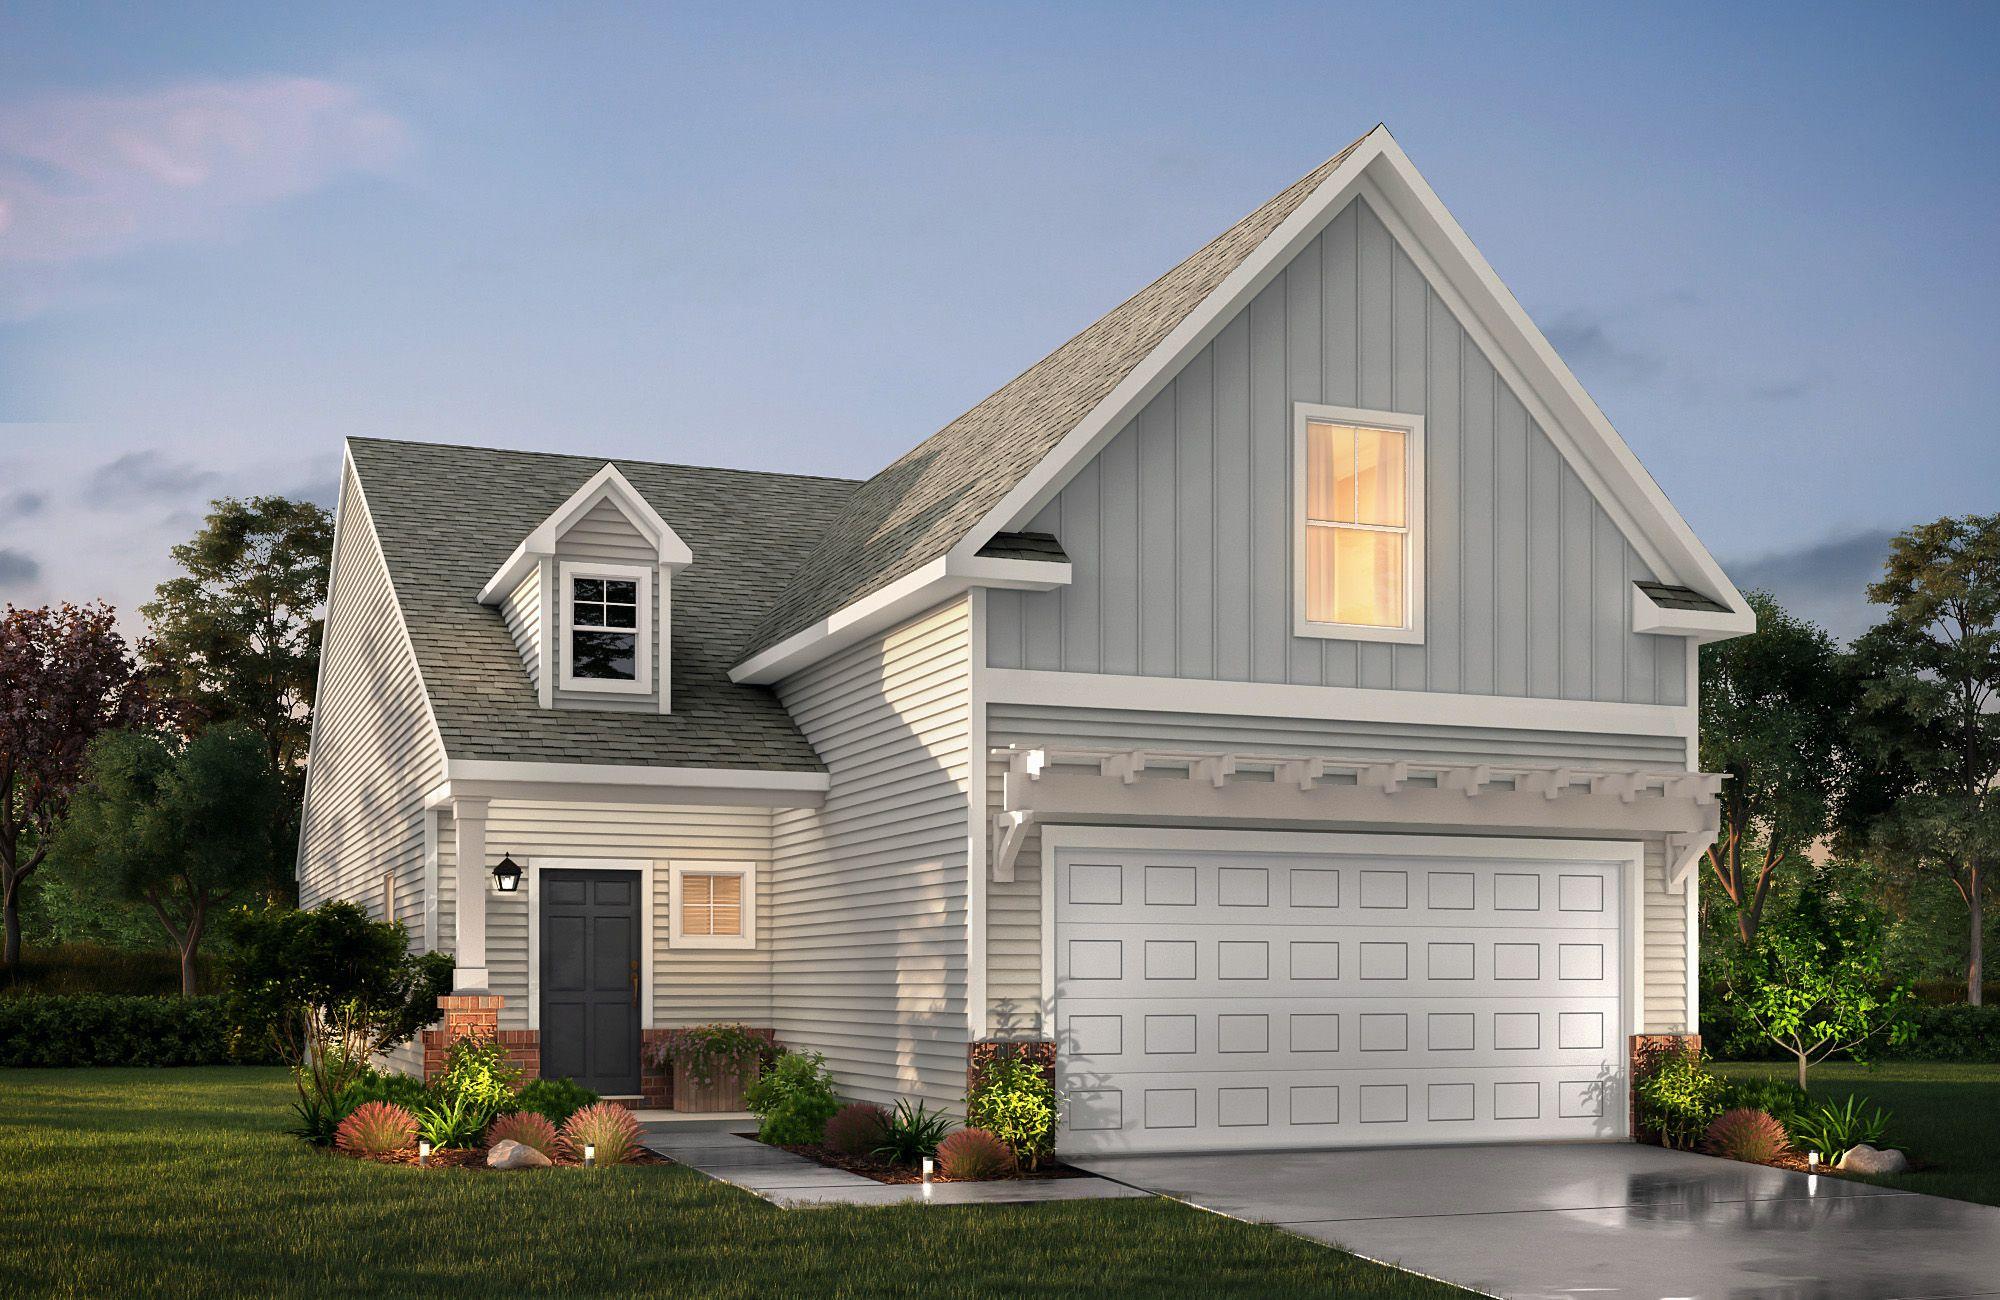 Owen E B2b In 2020 True Homes House Elevation Floor Plans